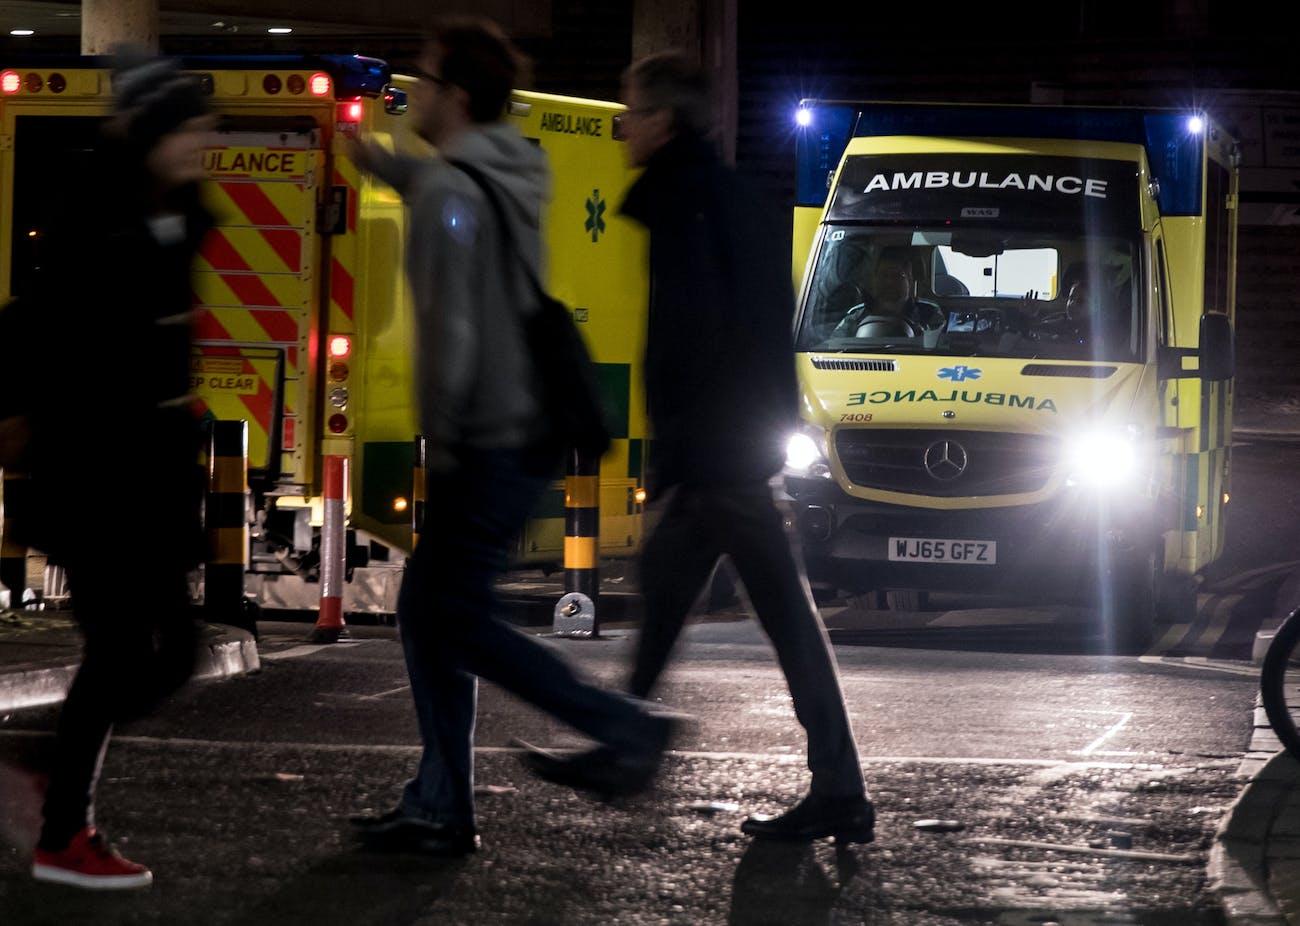 Would you trust an autonomous ambulance to drive safely?